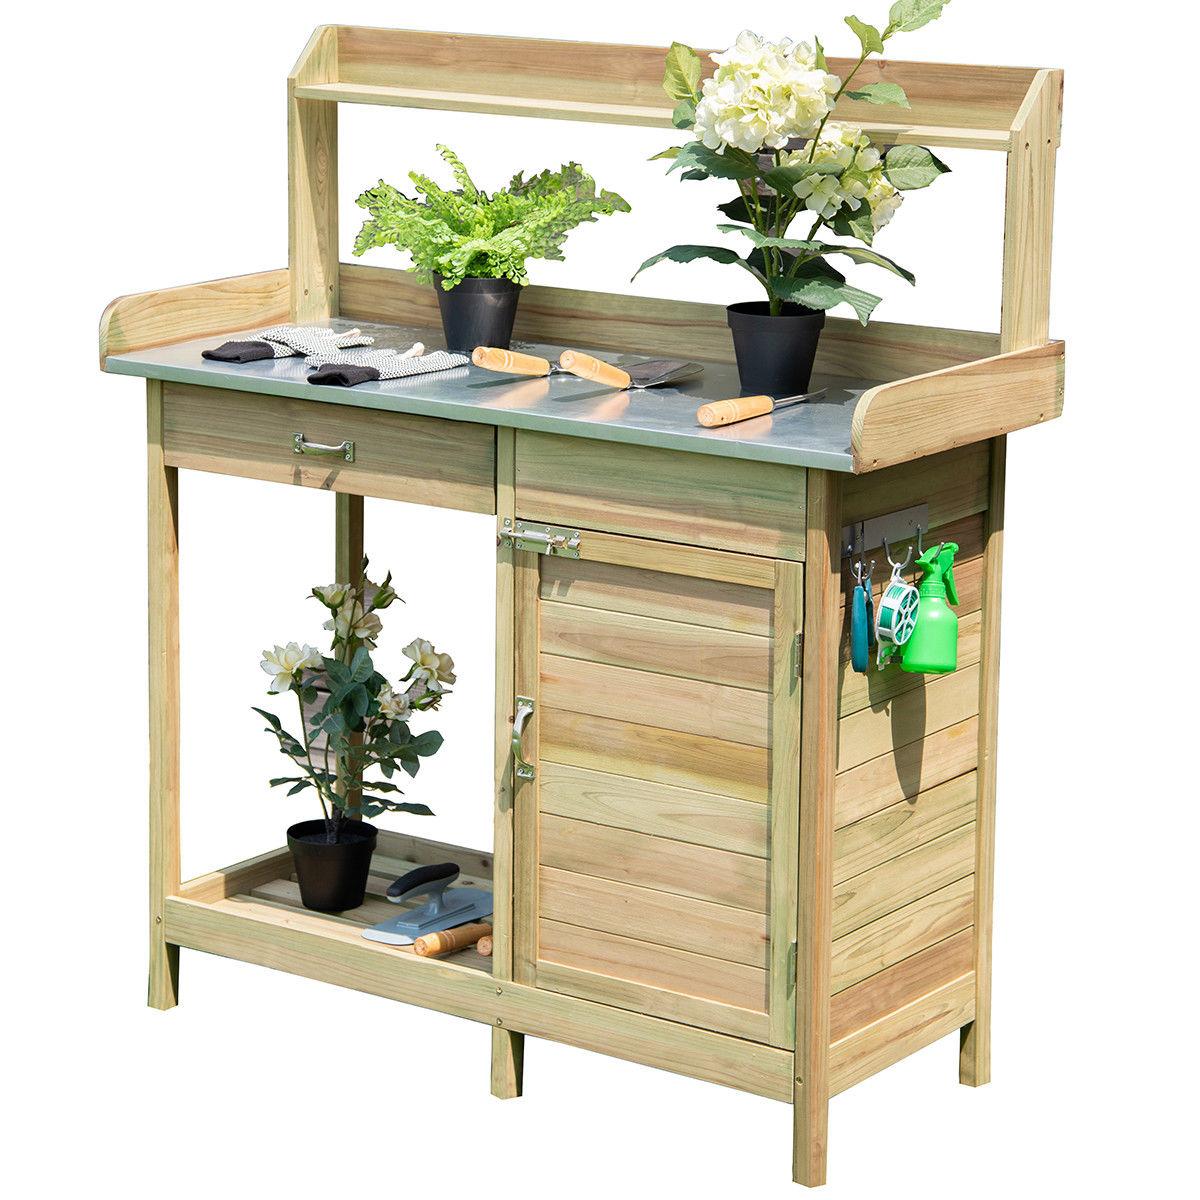 Costway Outdoor Potting Bench Garden Wooden Work Station Metal Tabletop Cabinet Drawer